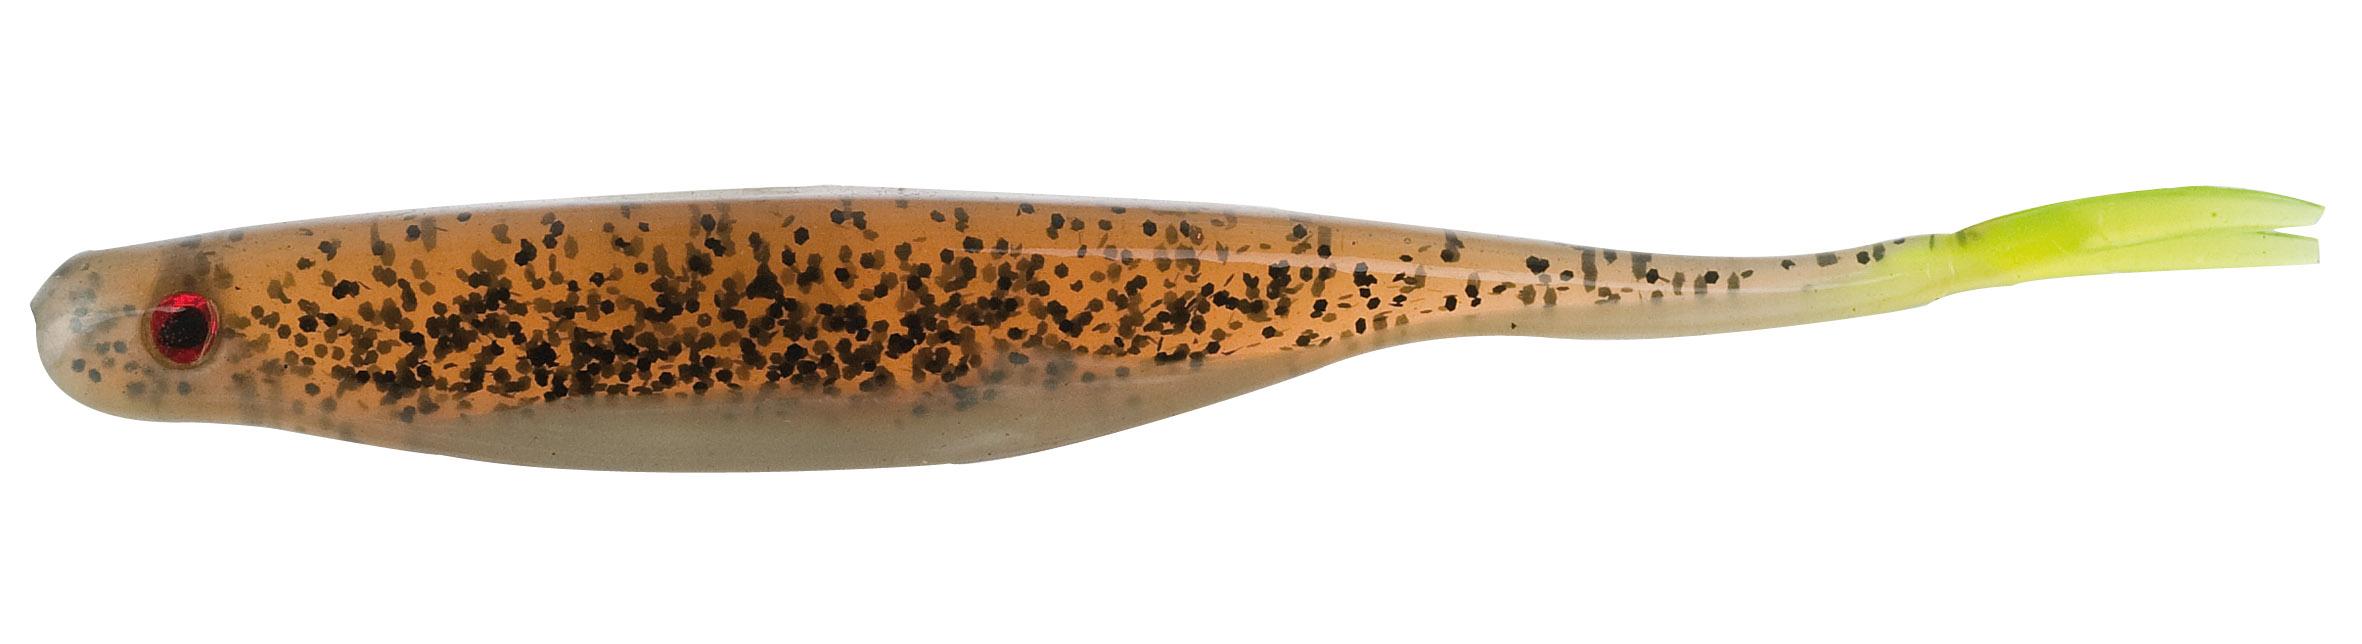 Iron Claw gumová nástraha Premium Split Tail 15 cm Vzor BP, 3ks/bal